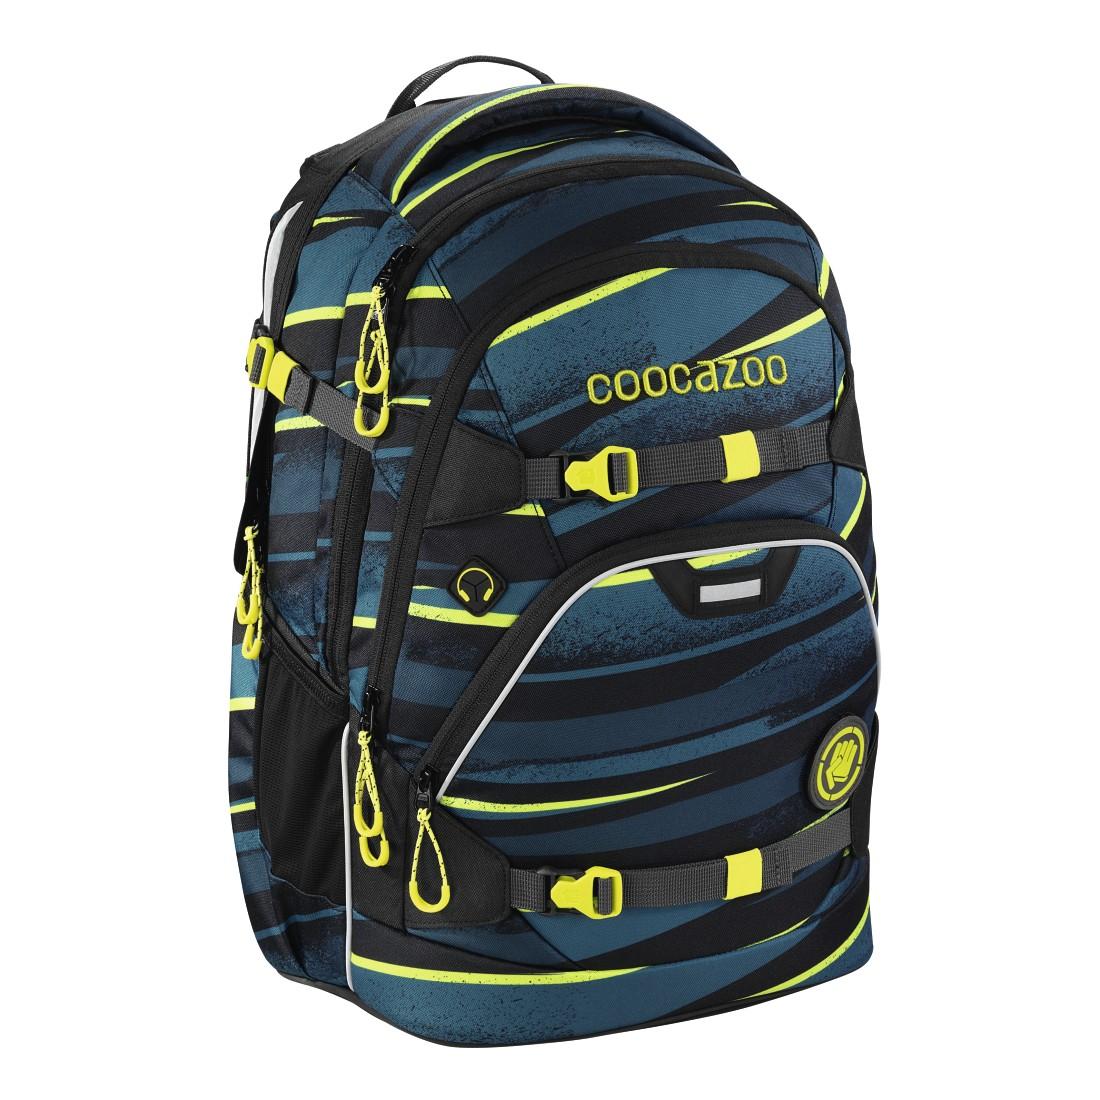 Školní batoh Coocazoo ScaleRale b92a7140b5